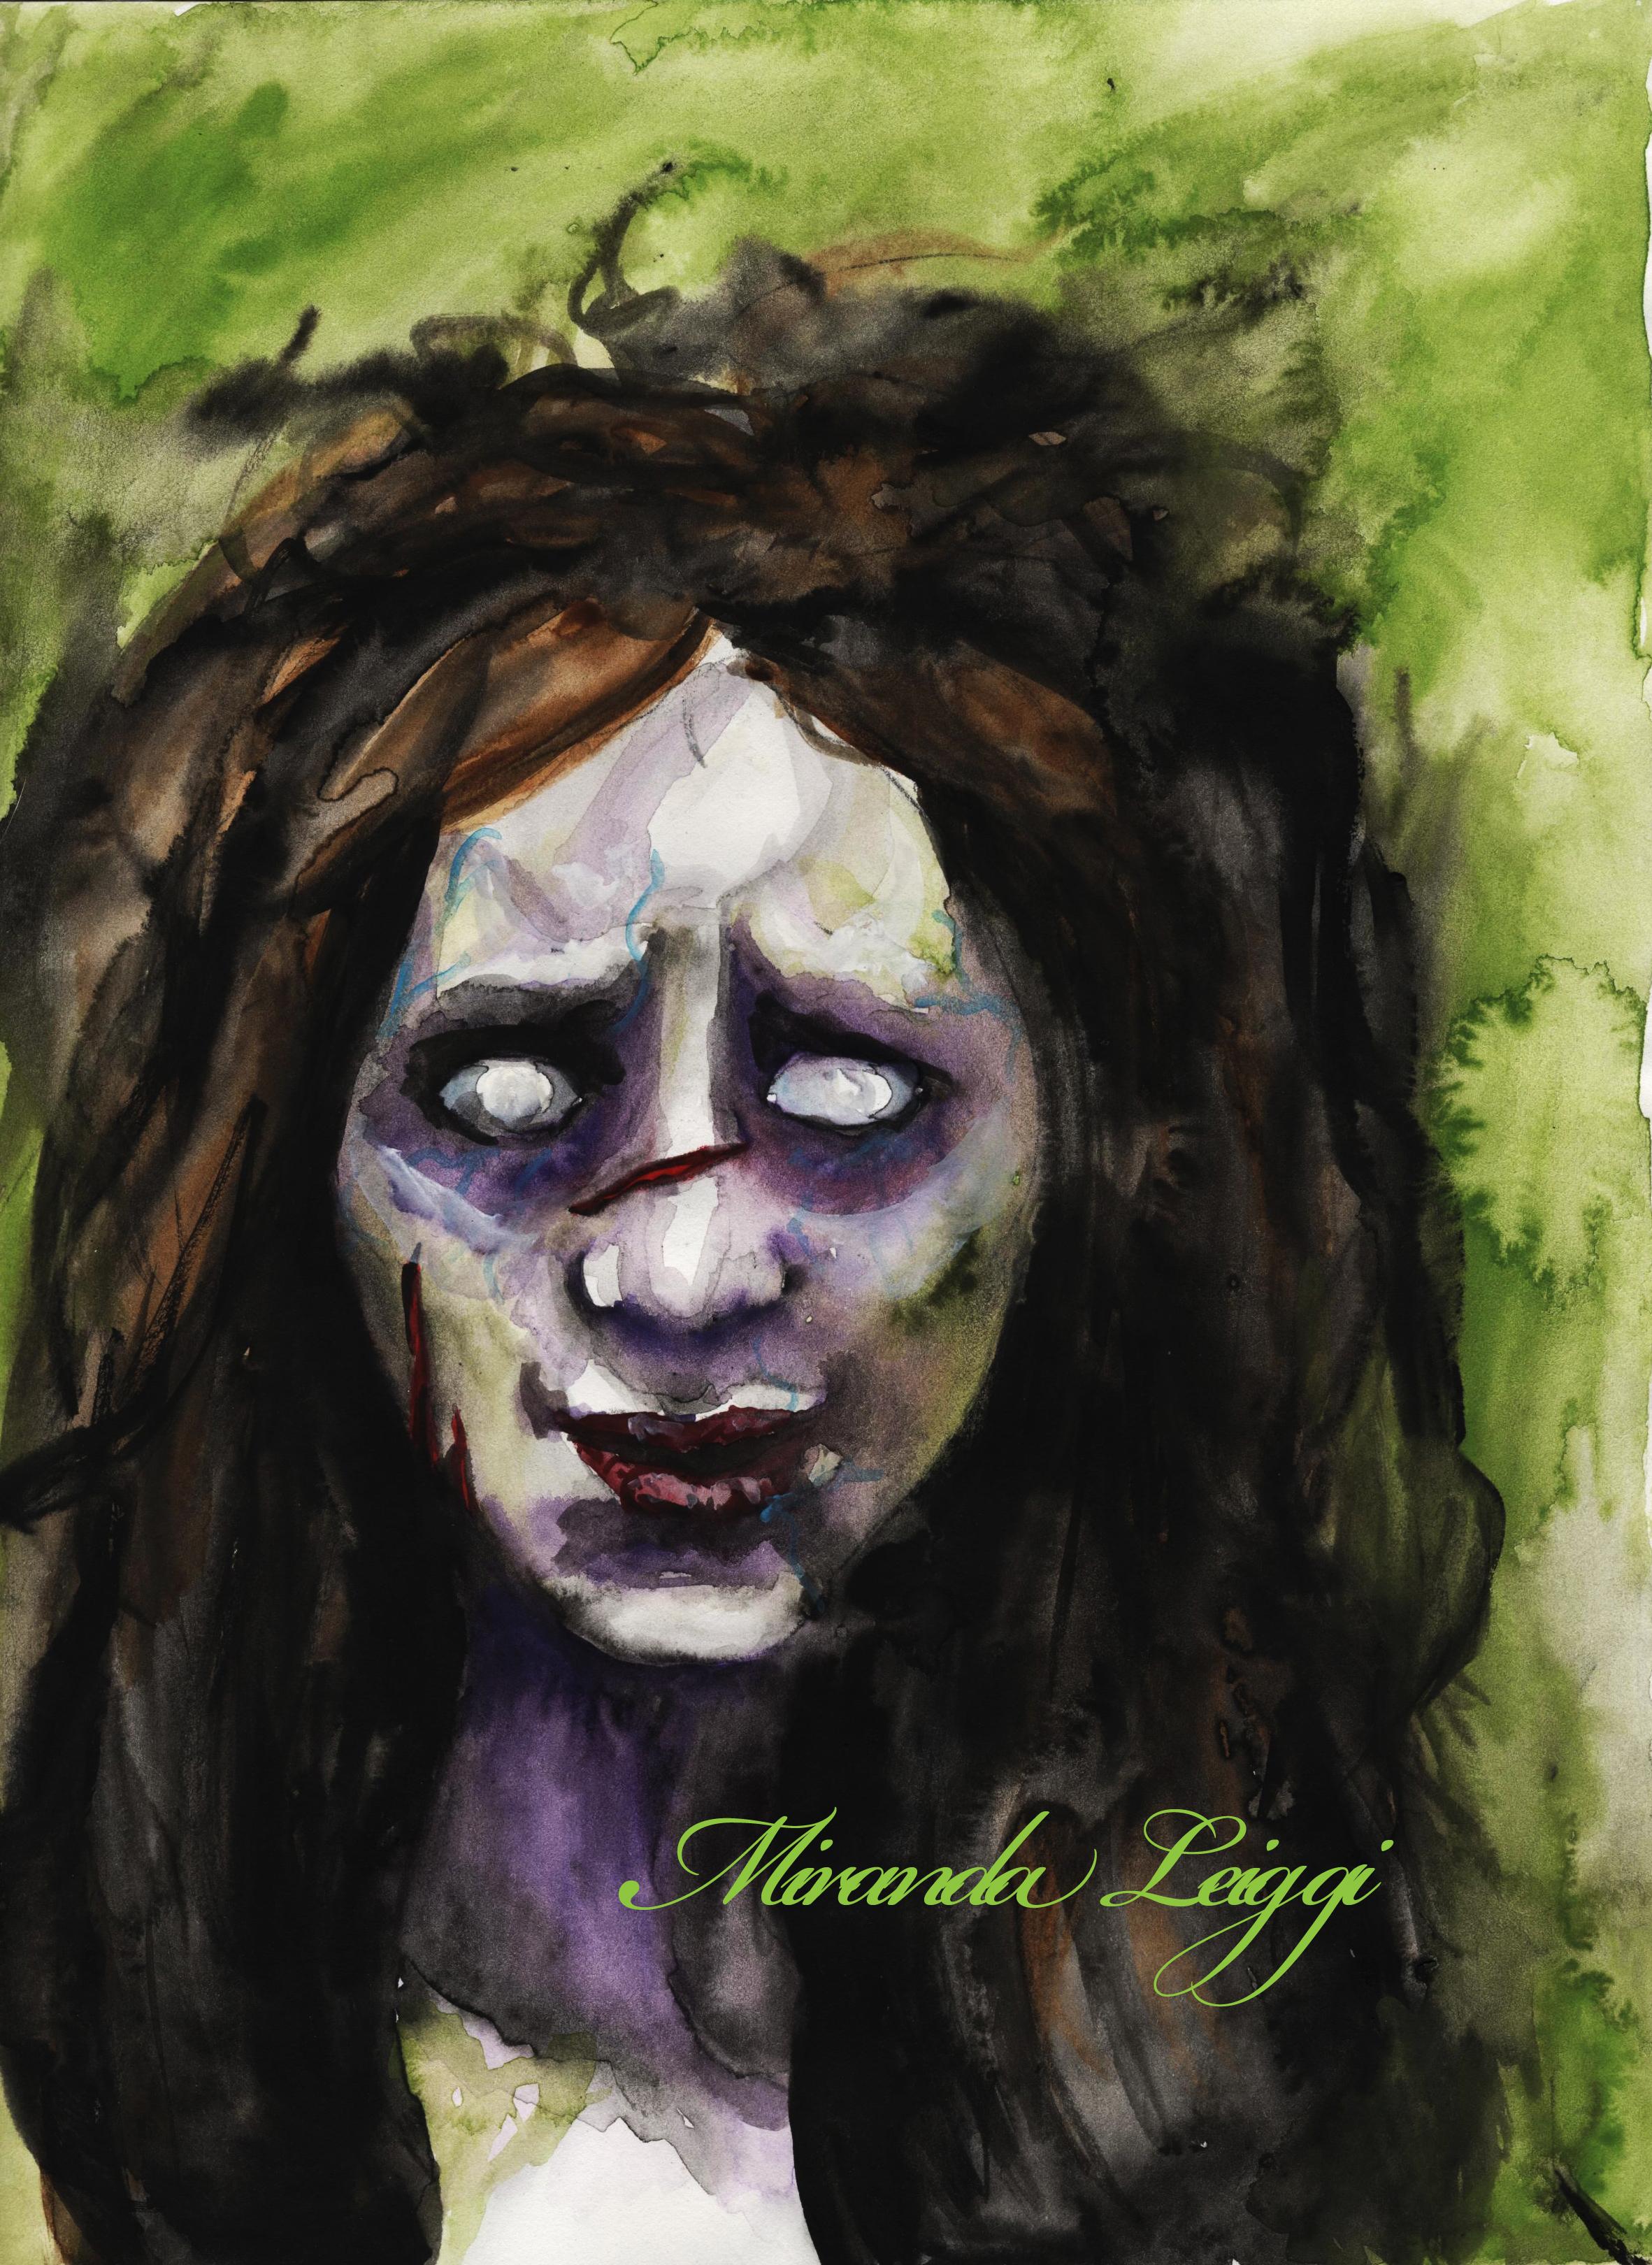 watercolor, painting, makeup rendering, zombie, horror, dark art